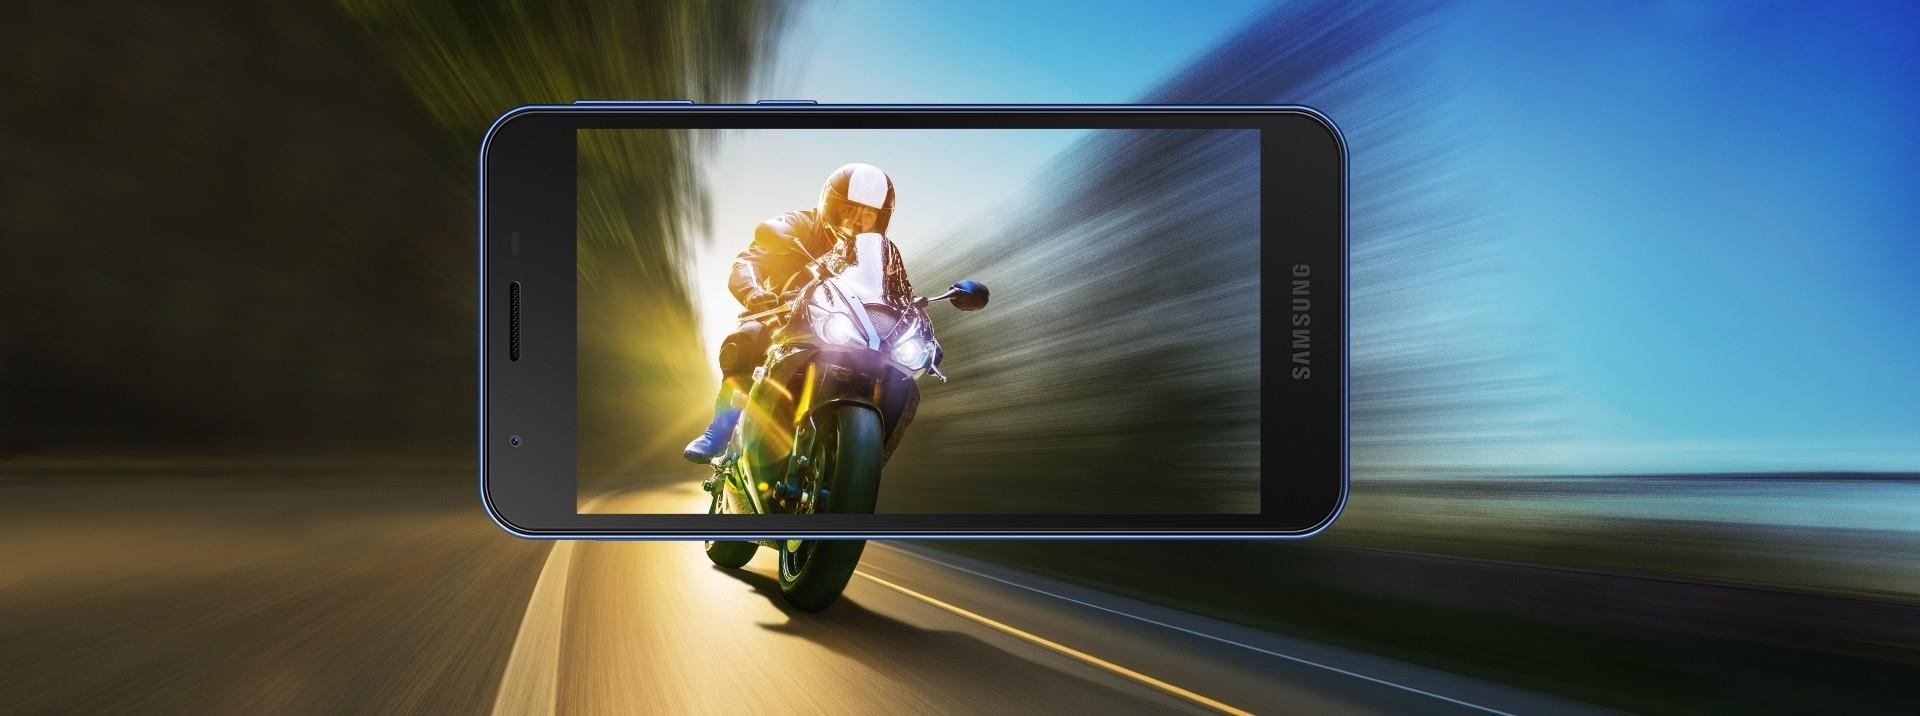 Processeur Exynos Octa Core pour Samsung Galaxy A2 Core